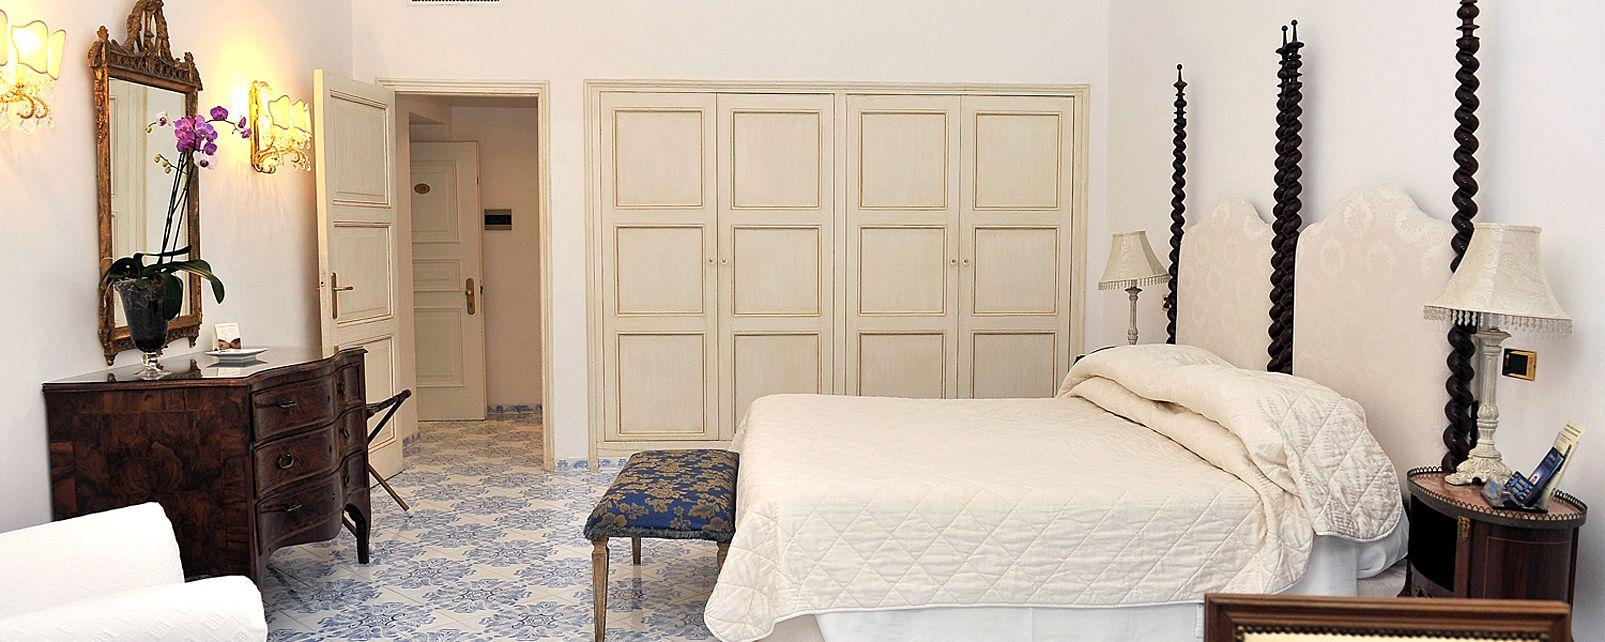 Hotel Grand Hotel Quisisana